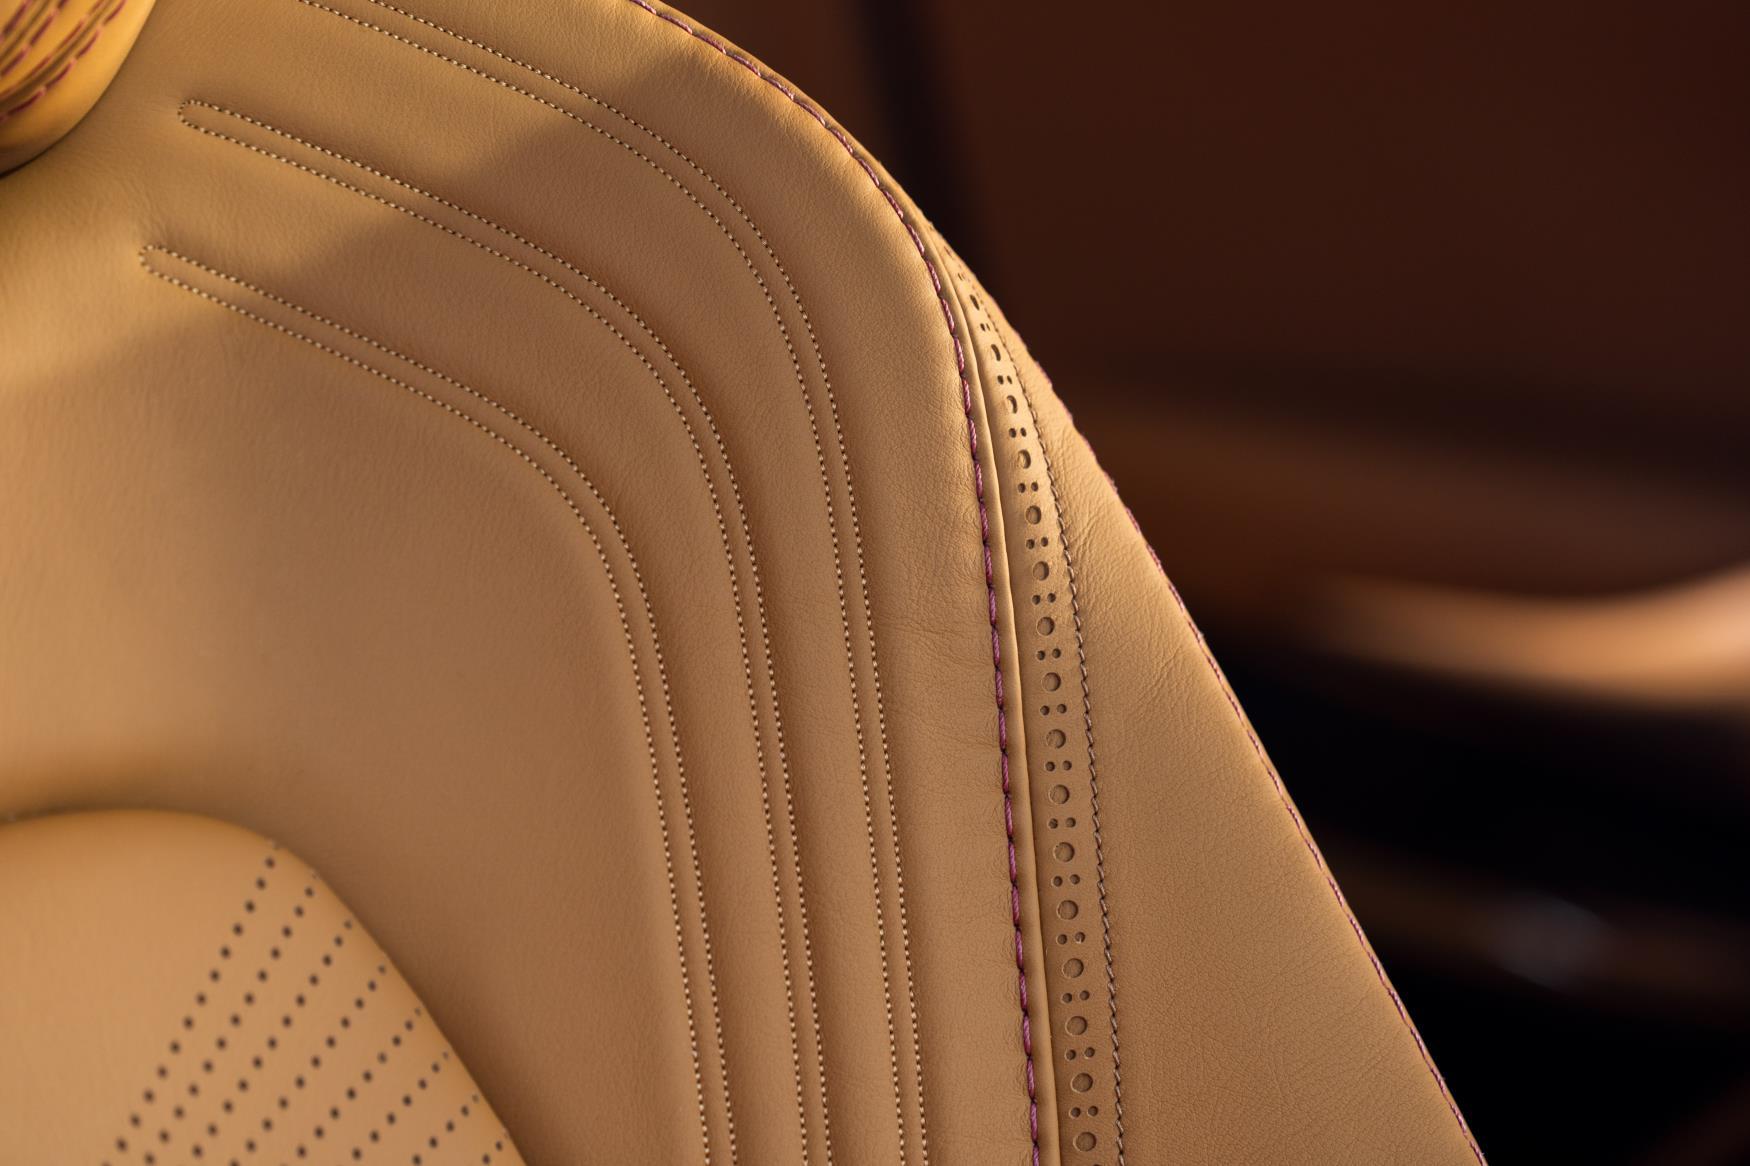 Aston Martin DBX Stitching